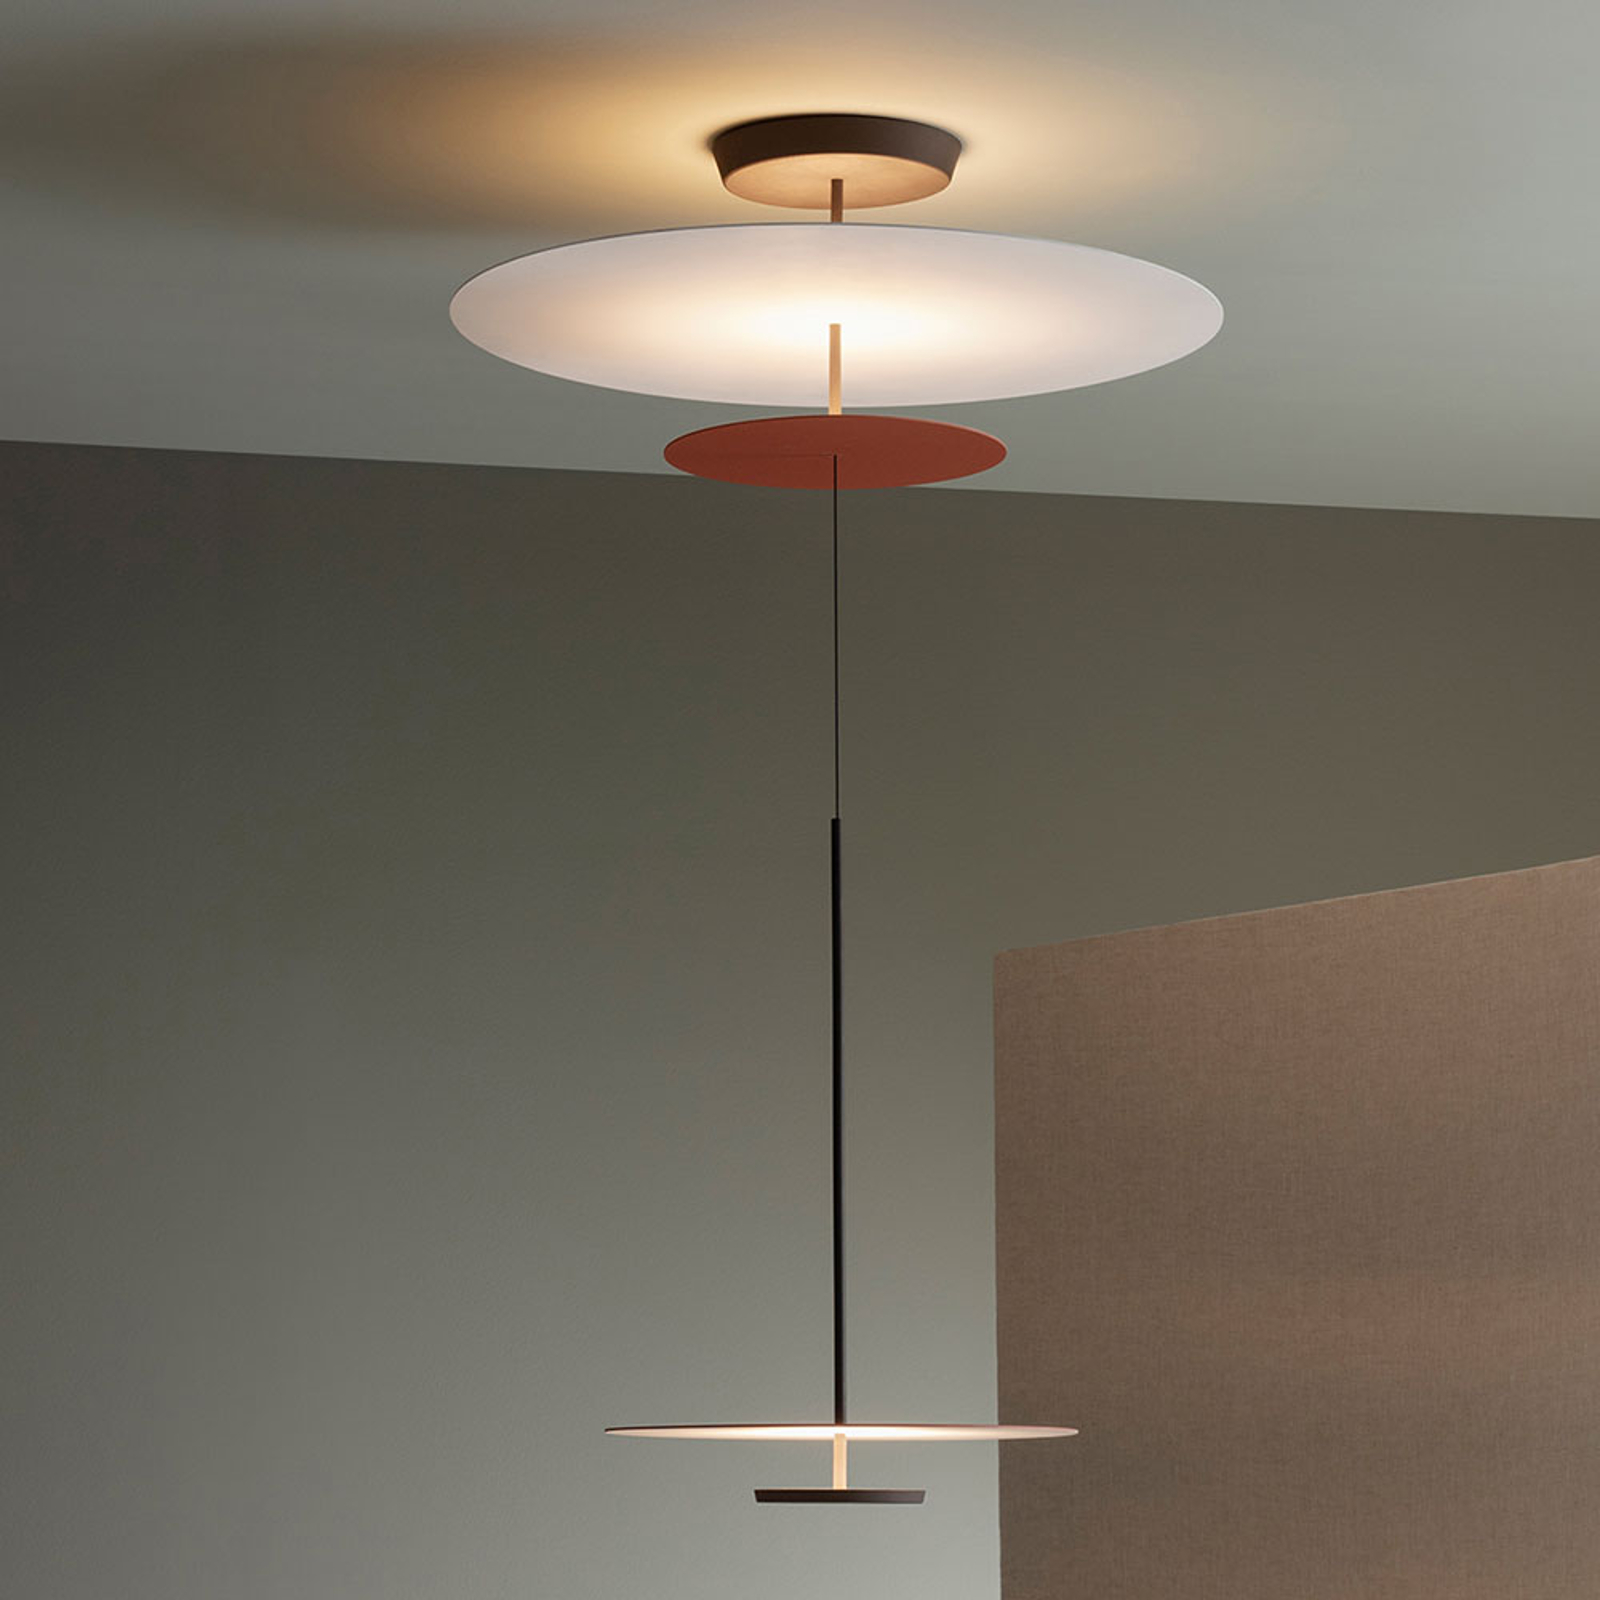 Vibia Flat LED-hengelampe 3 lys, Ø 90cm terrakotta